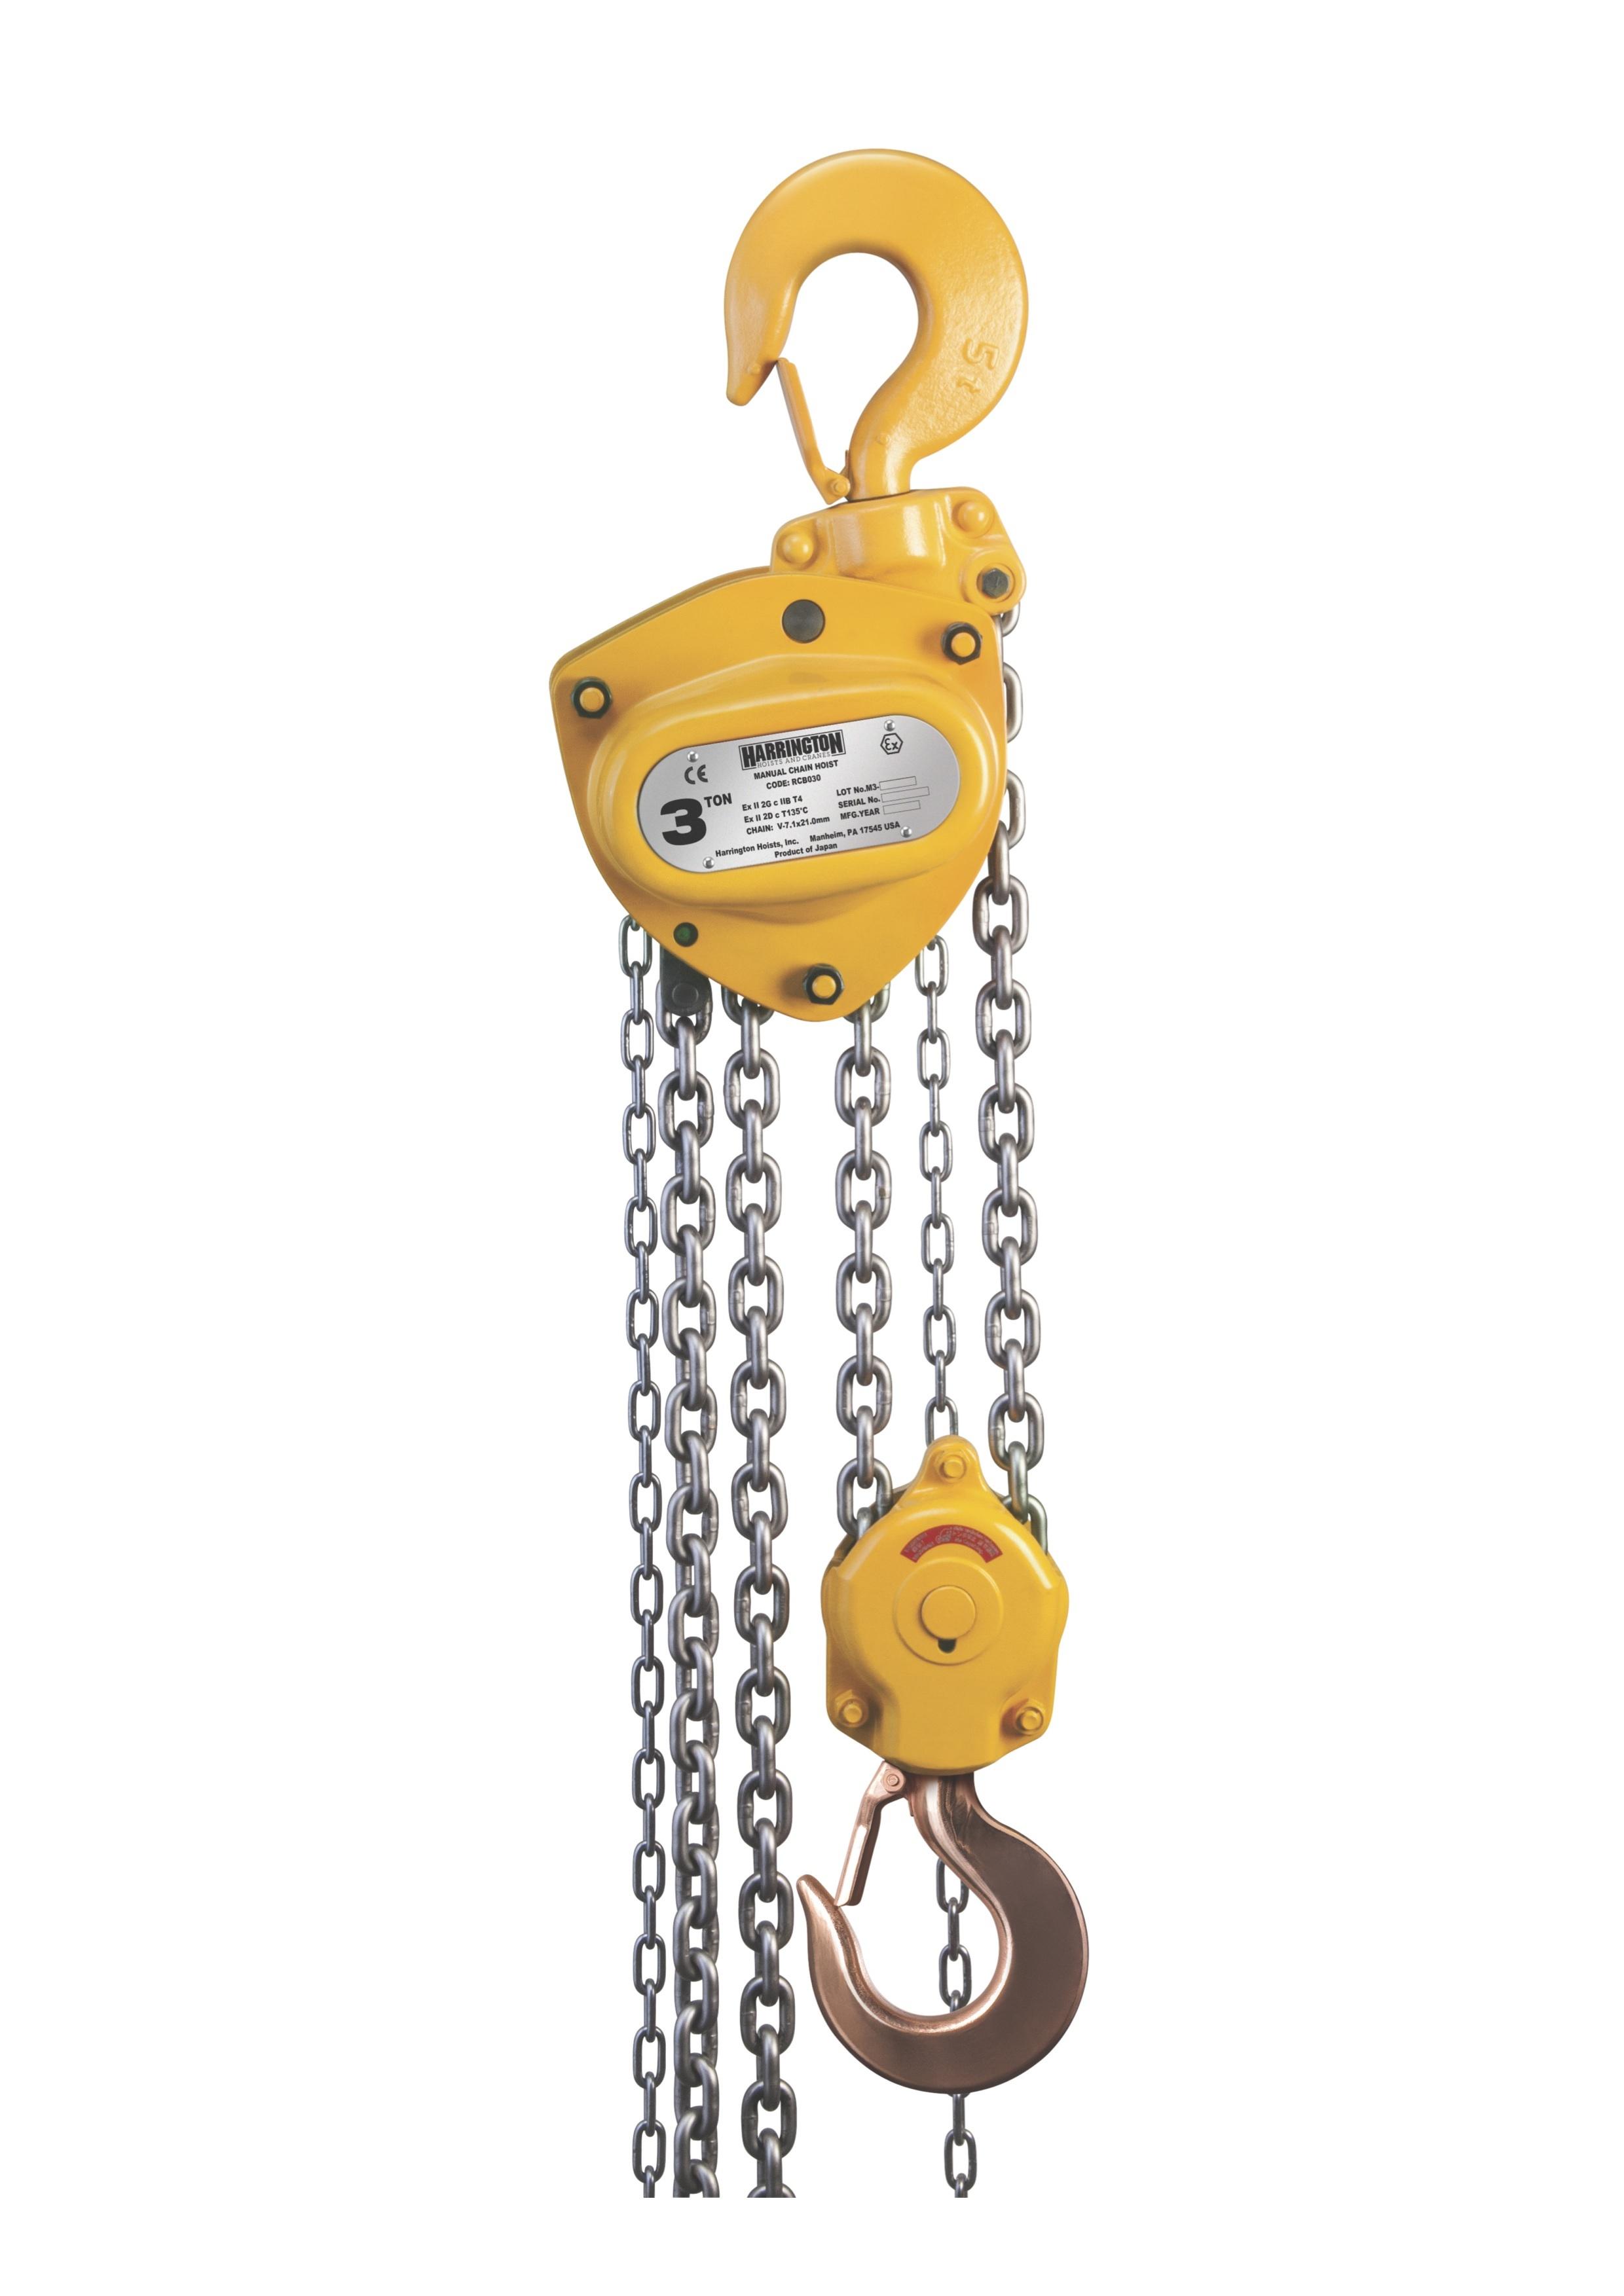 3t-manual-hoist-5679-p32